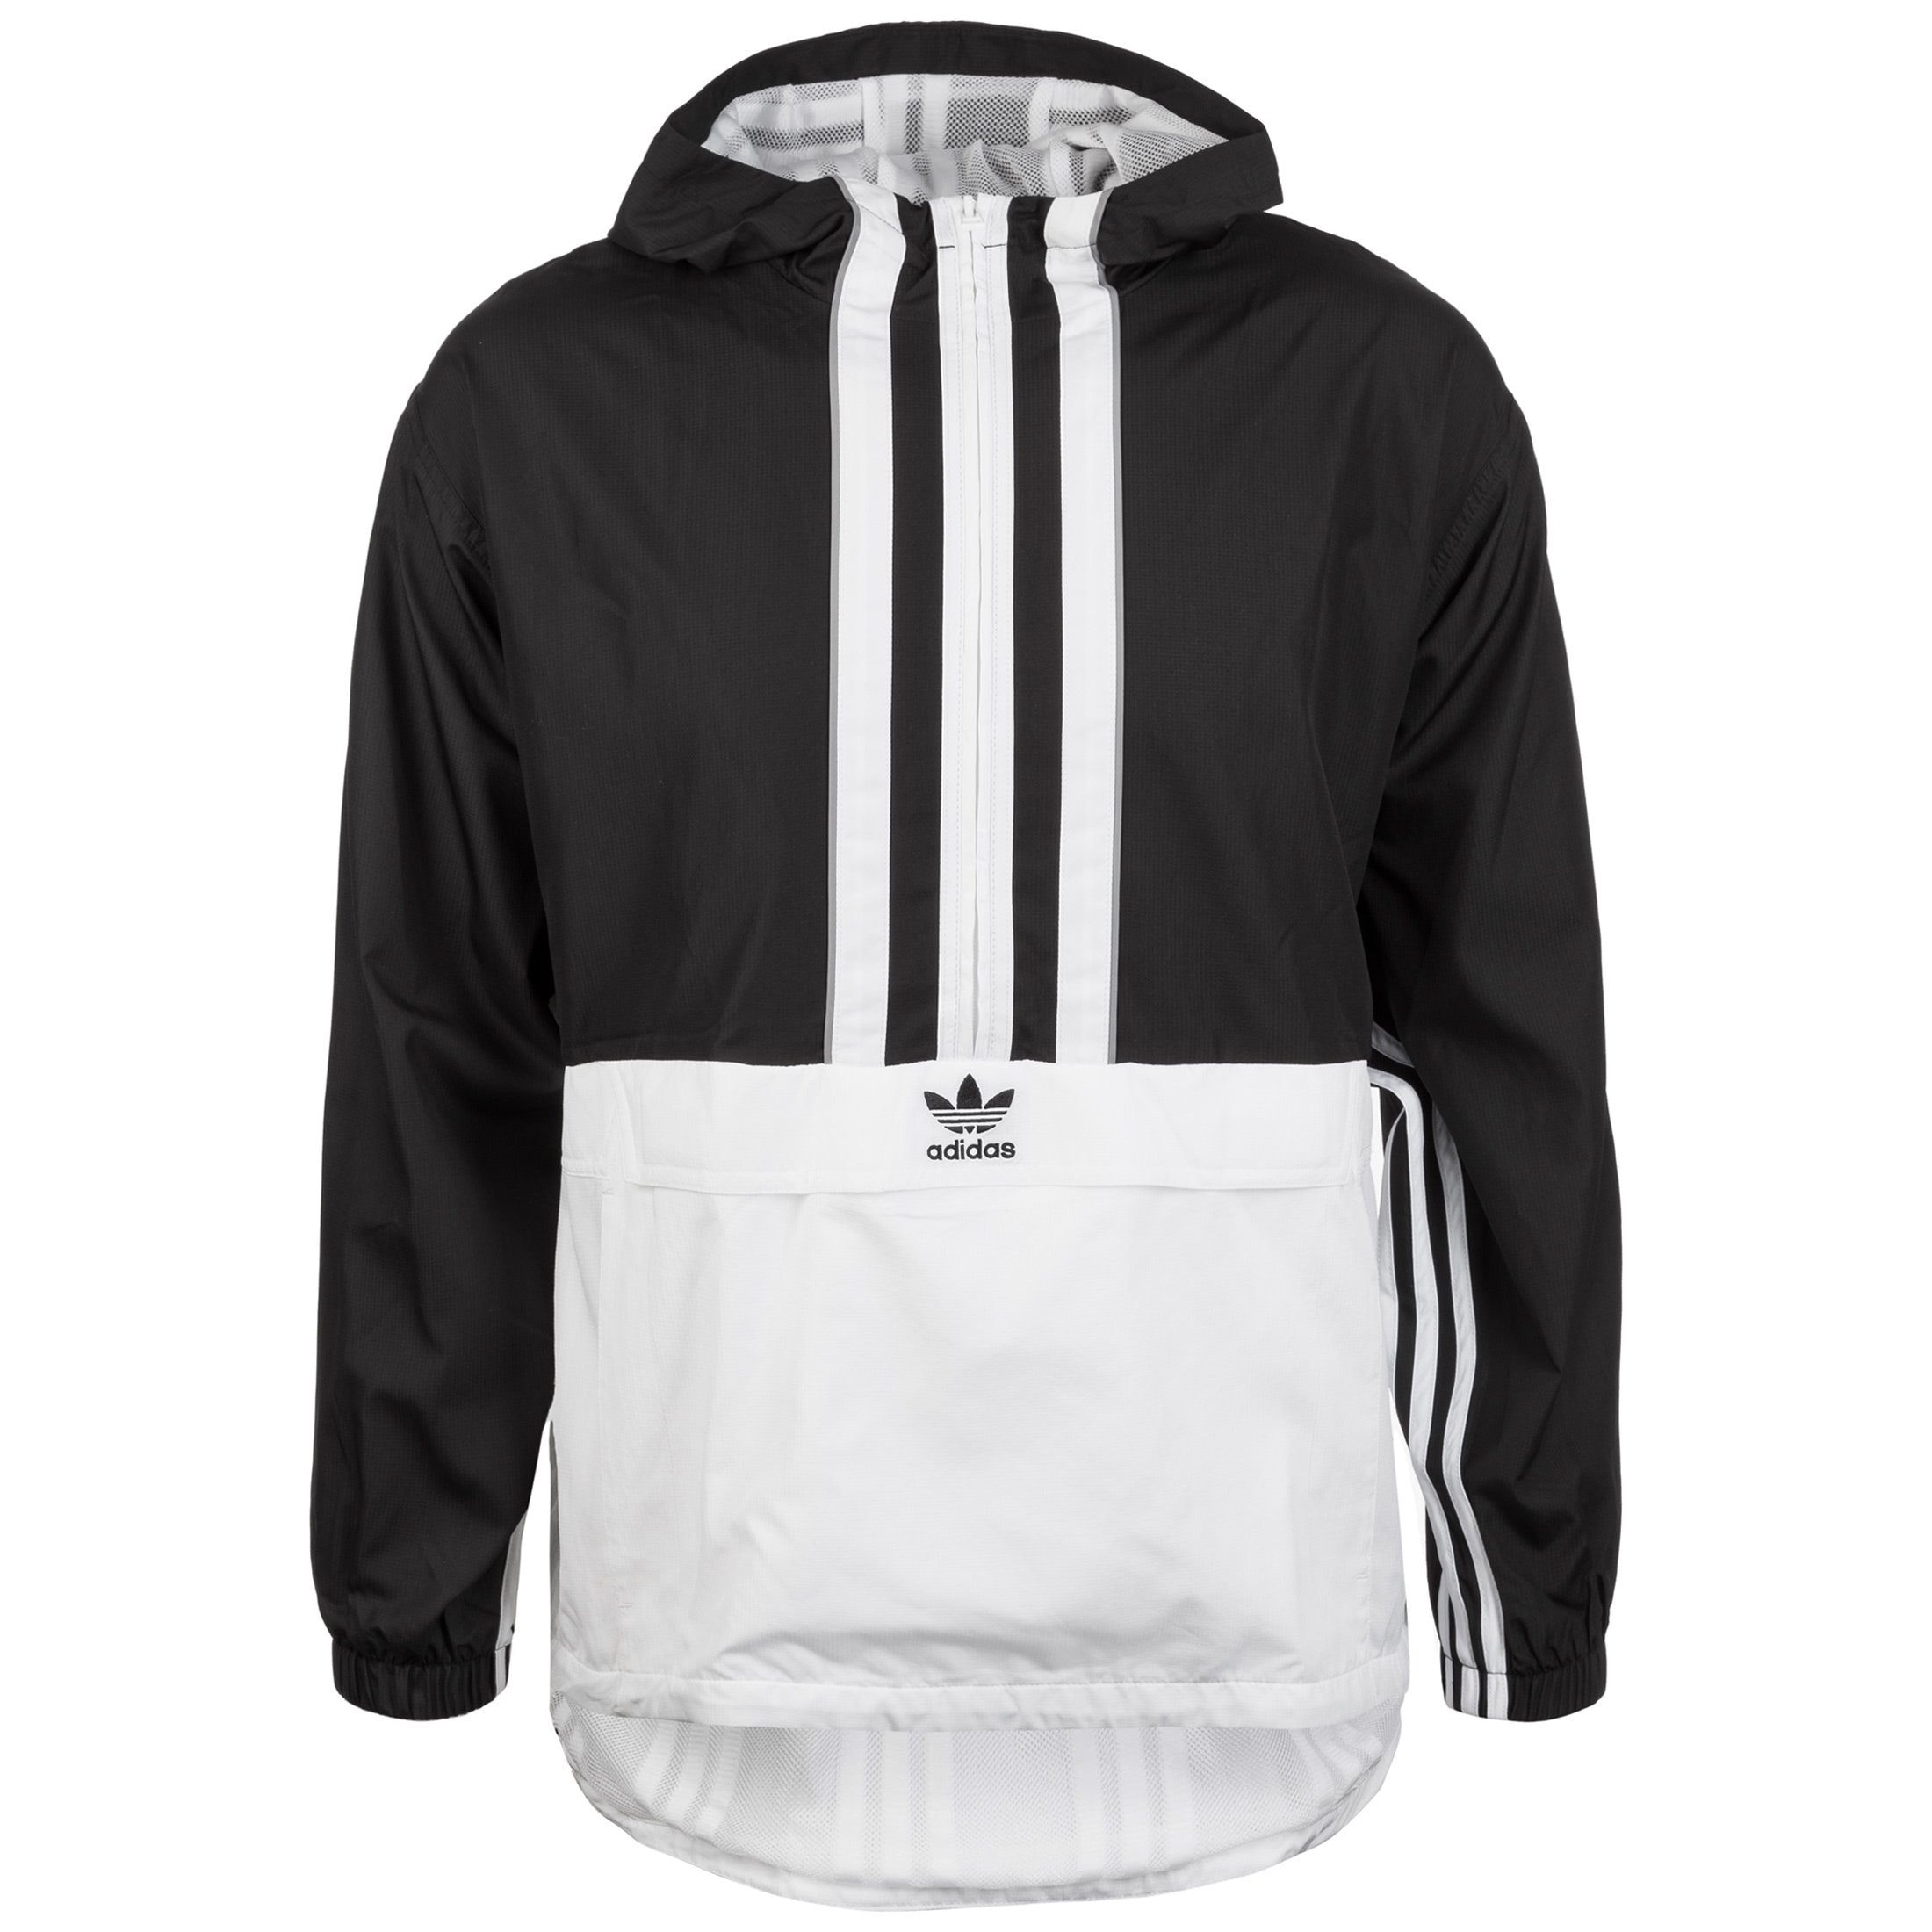 Image of adidas Originals Allwetterjacke »Authentics«